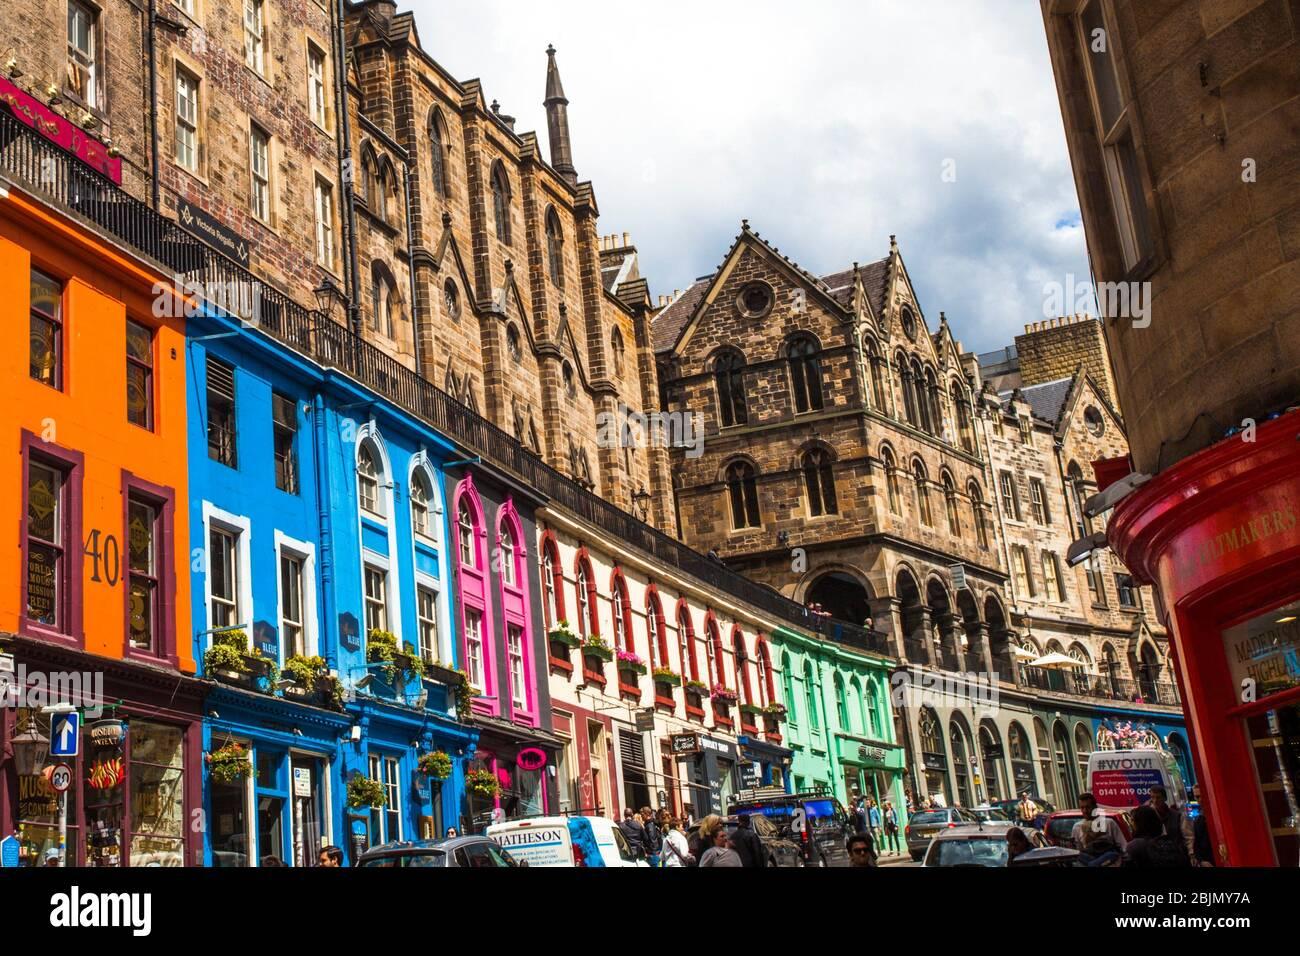 Victoria Street, Old Town, Edimburgo, Escocia, Reino Unido, Europa. Foto de stock